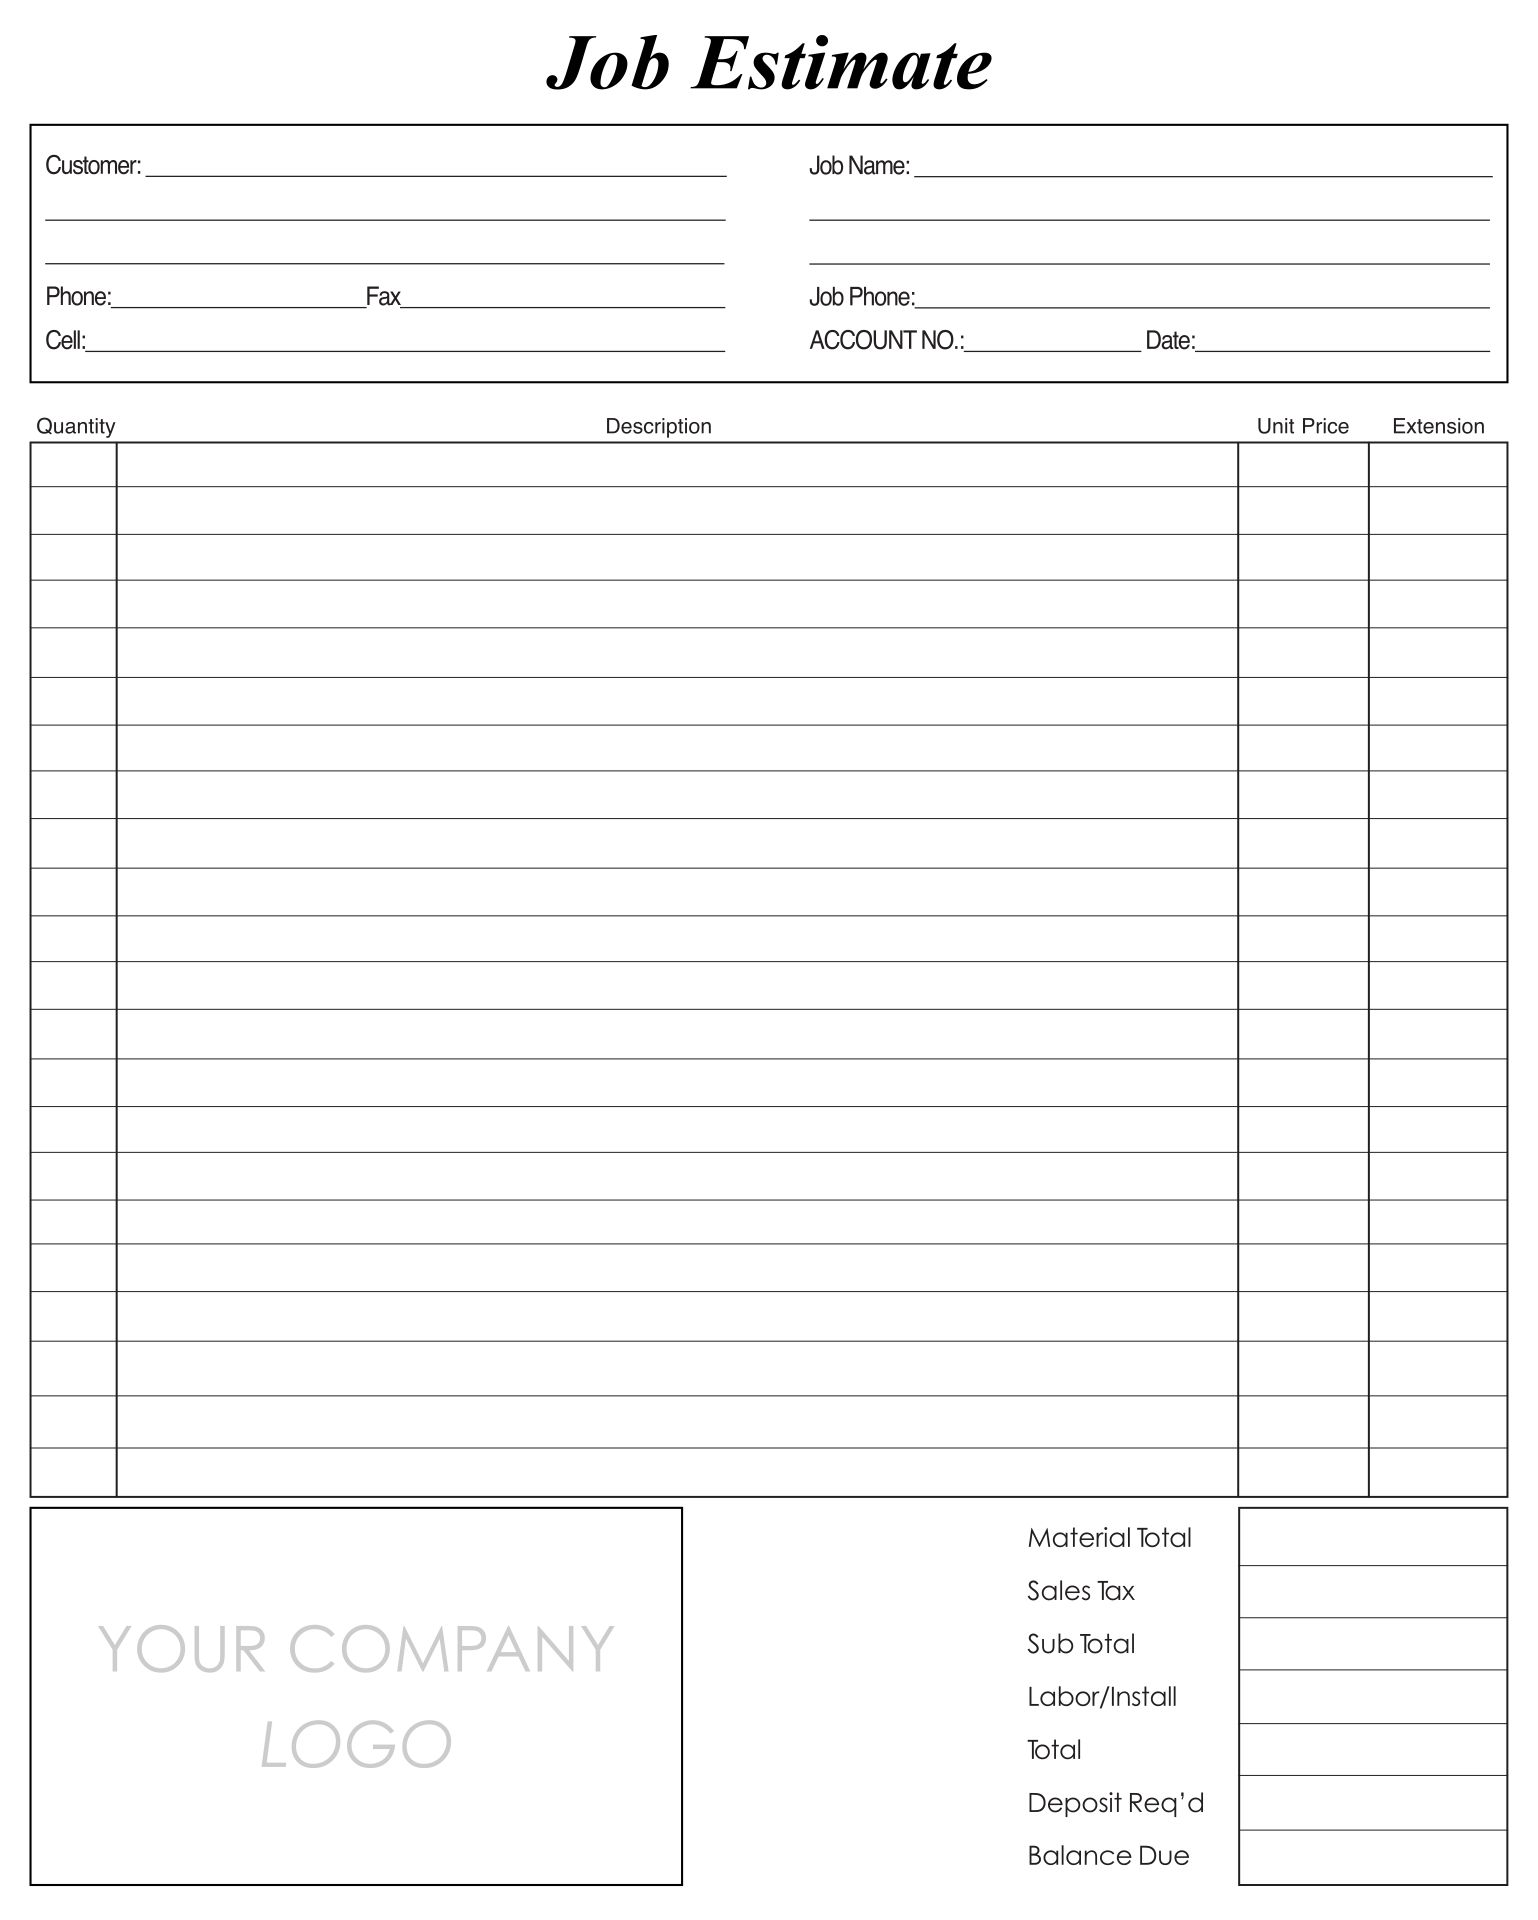 Printable Estimate Forms Templates